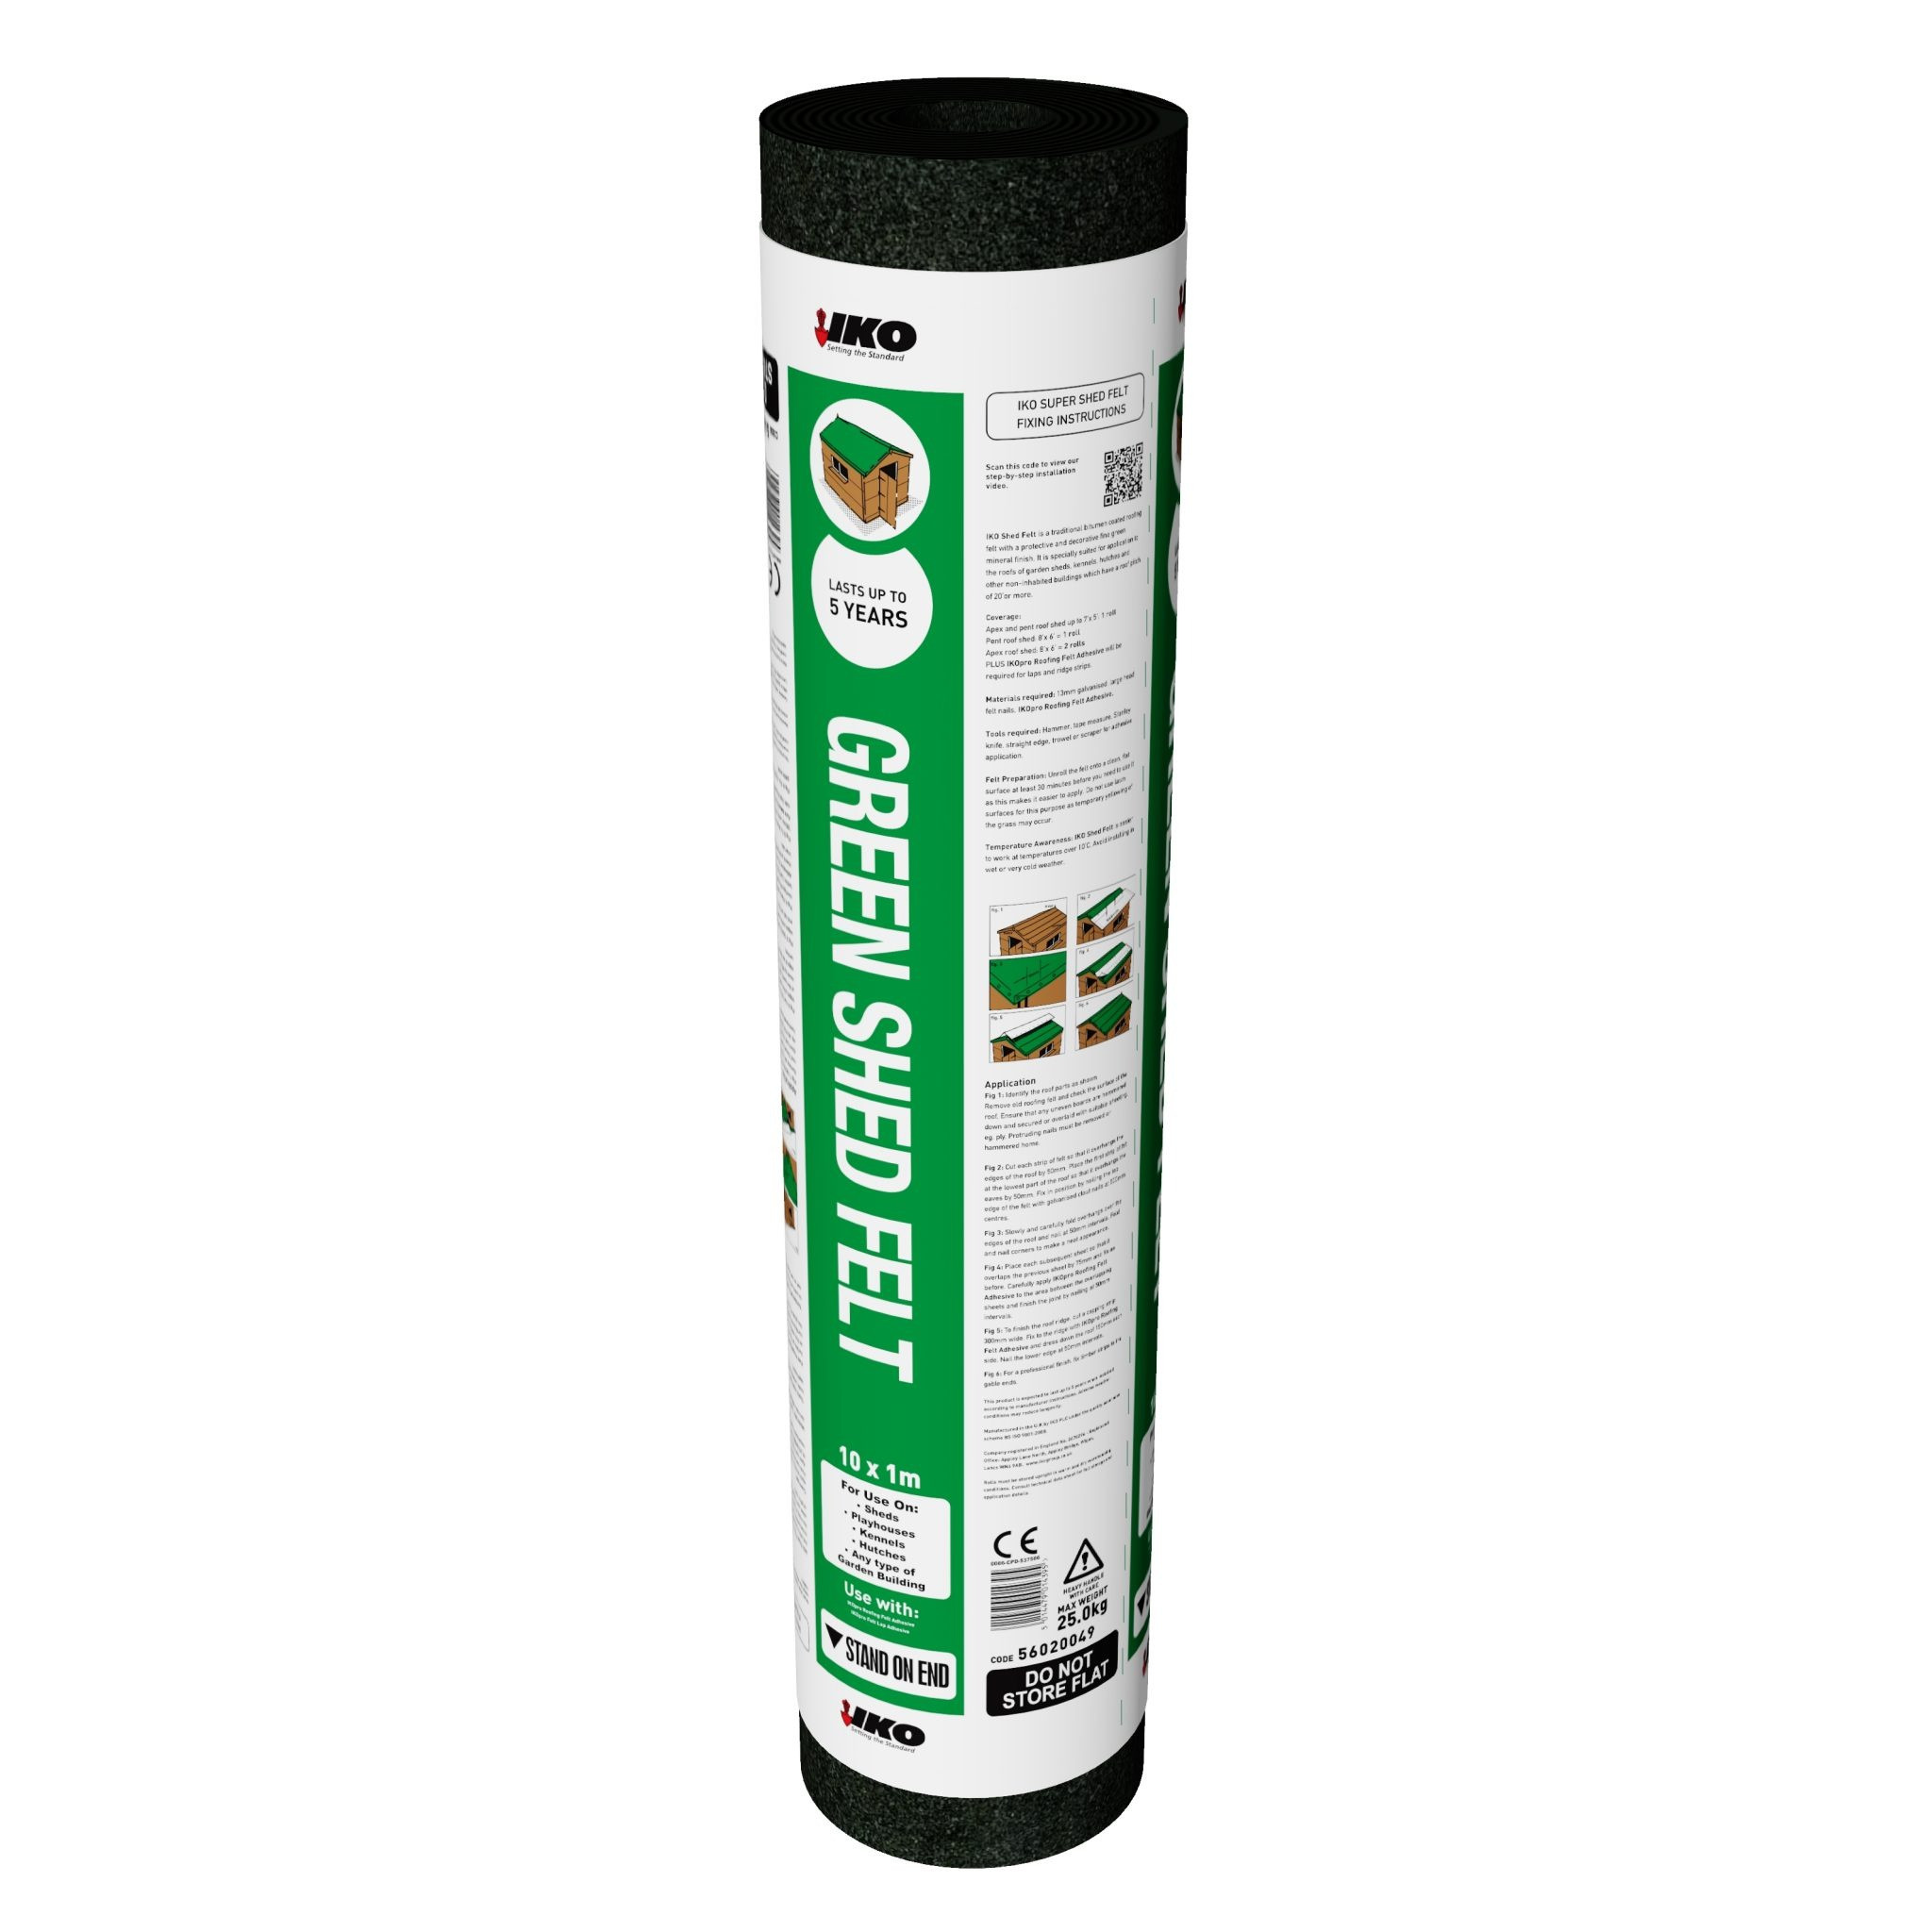 IKO Shed Felt Green 20Kg 1m x 8mt Roll